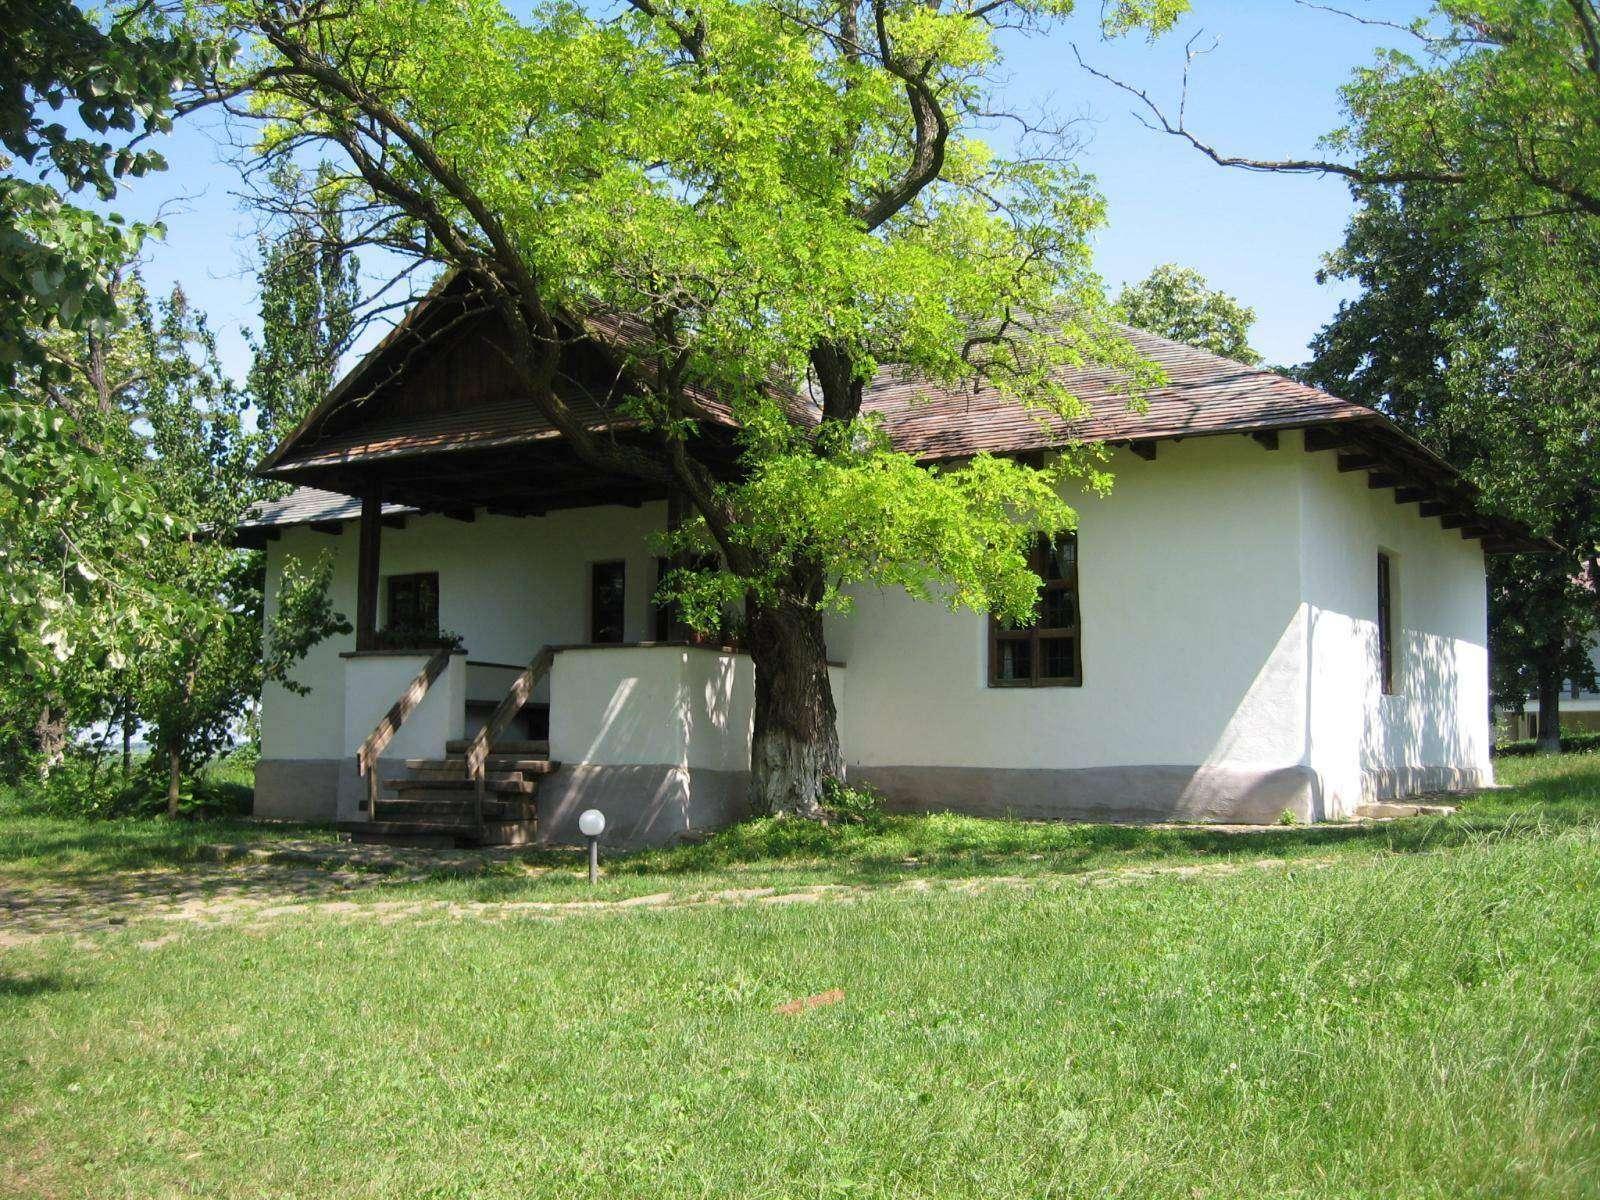 Mihai Eminescu Memorial House